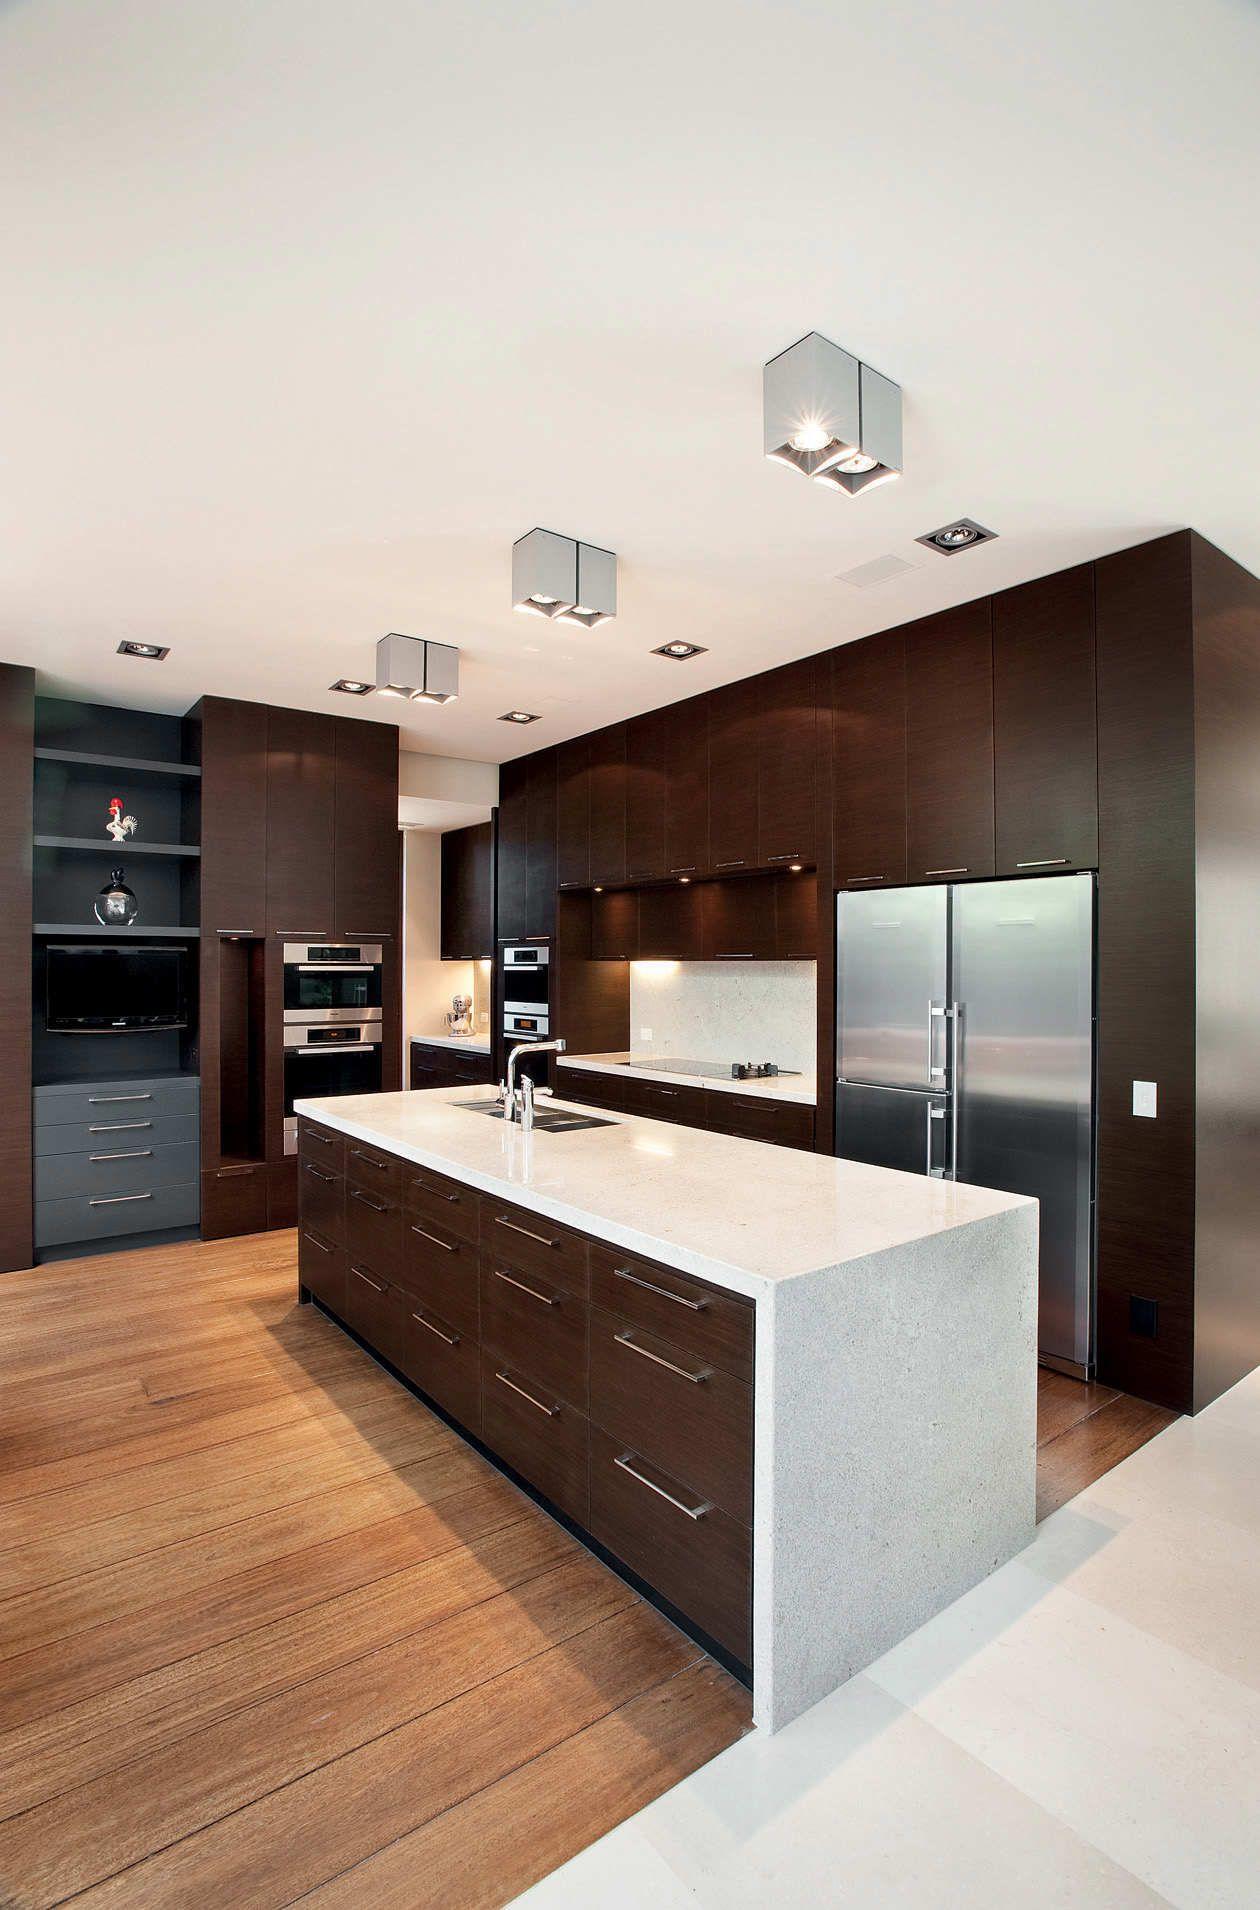 100 idee di cucine moderne con elementi in legno | Modern kitchen ...